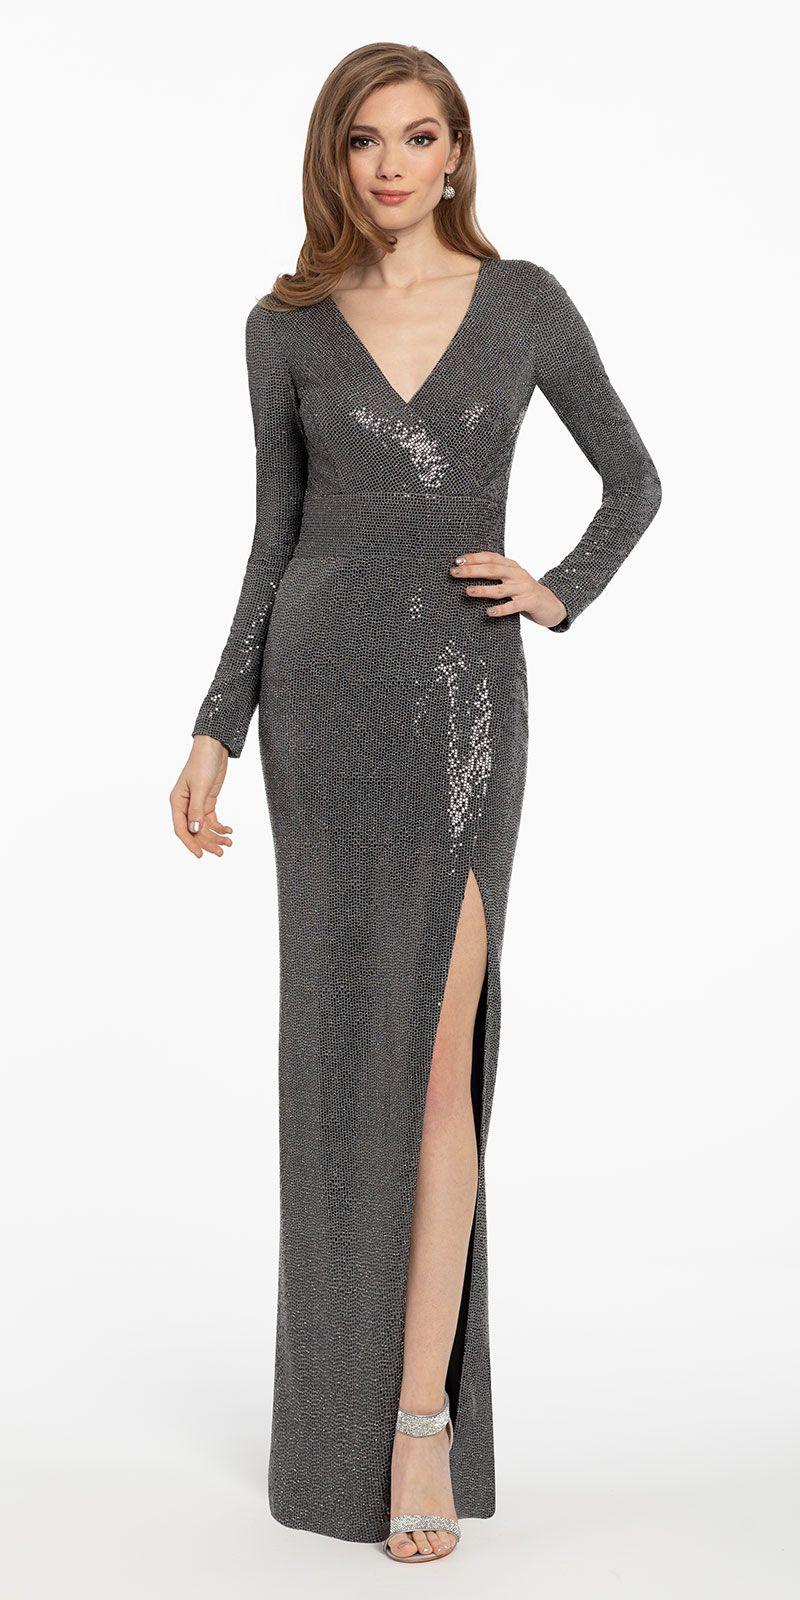 Long Sleeve Sequin Knit Surplice Bodice Dress Dresses